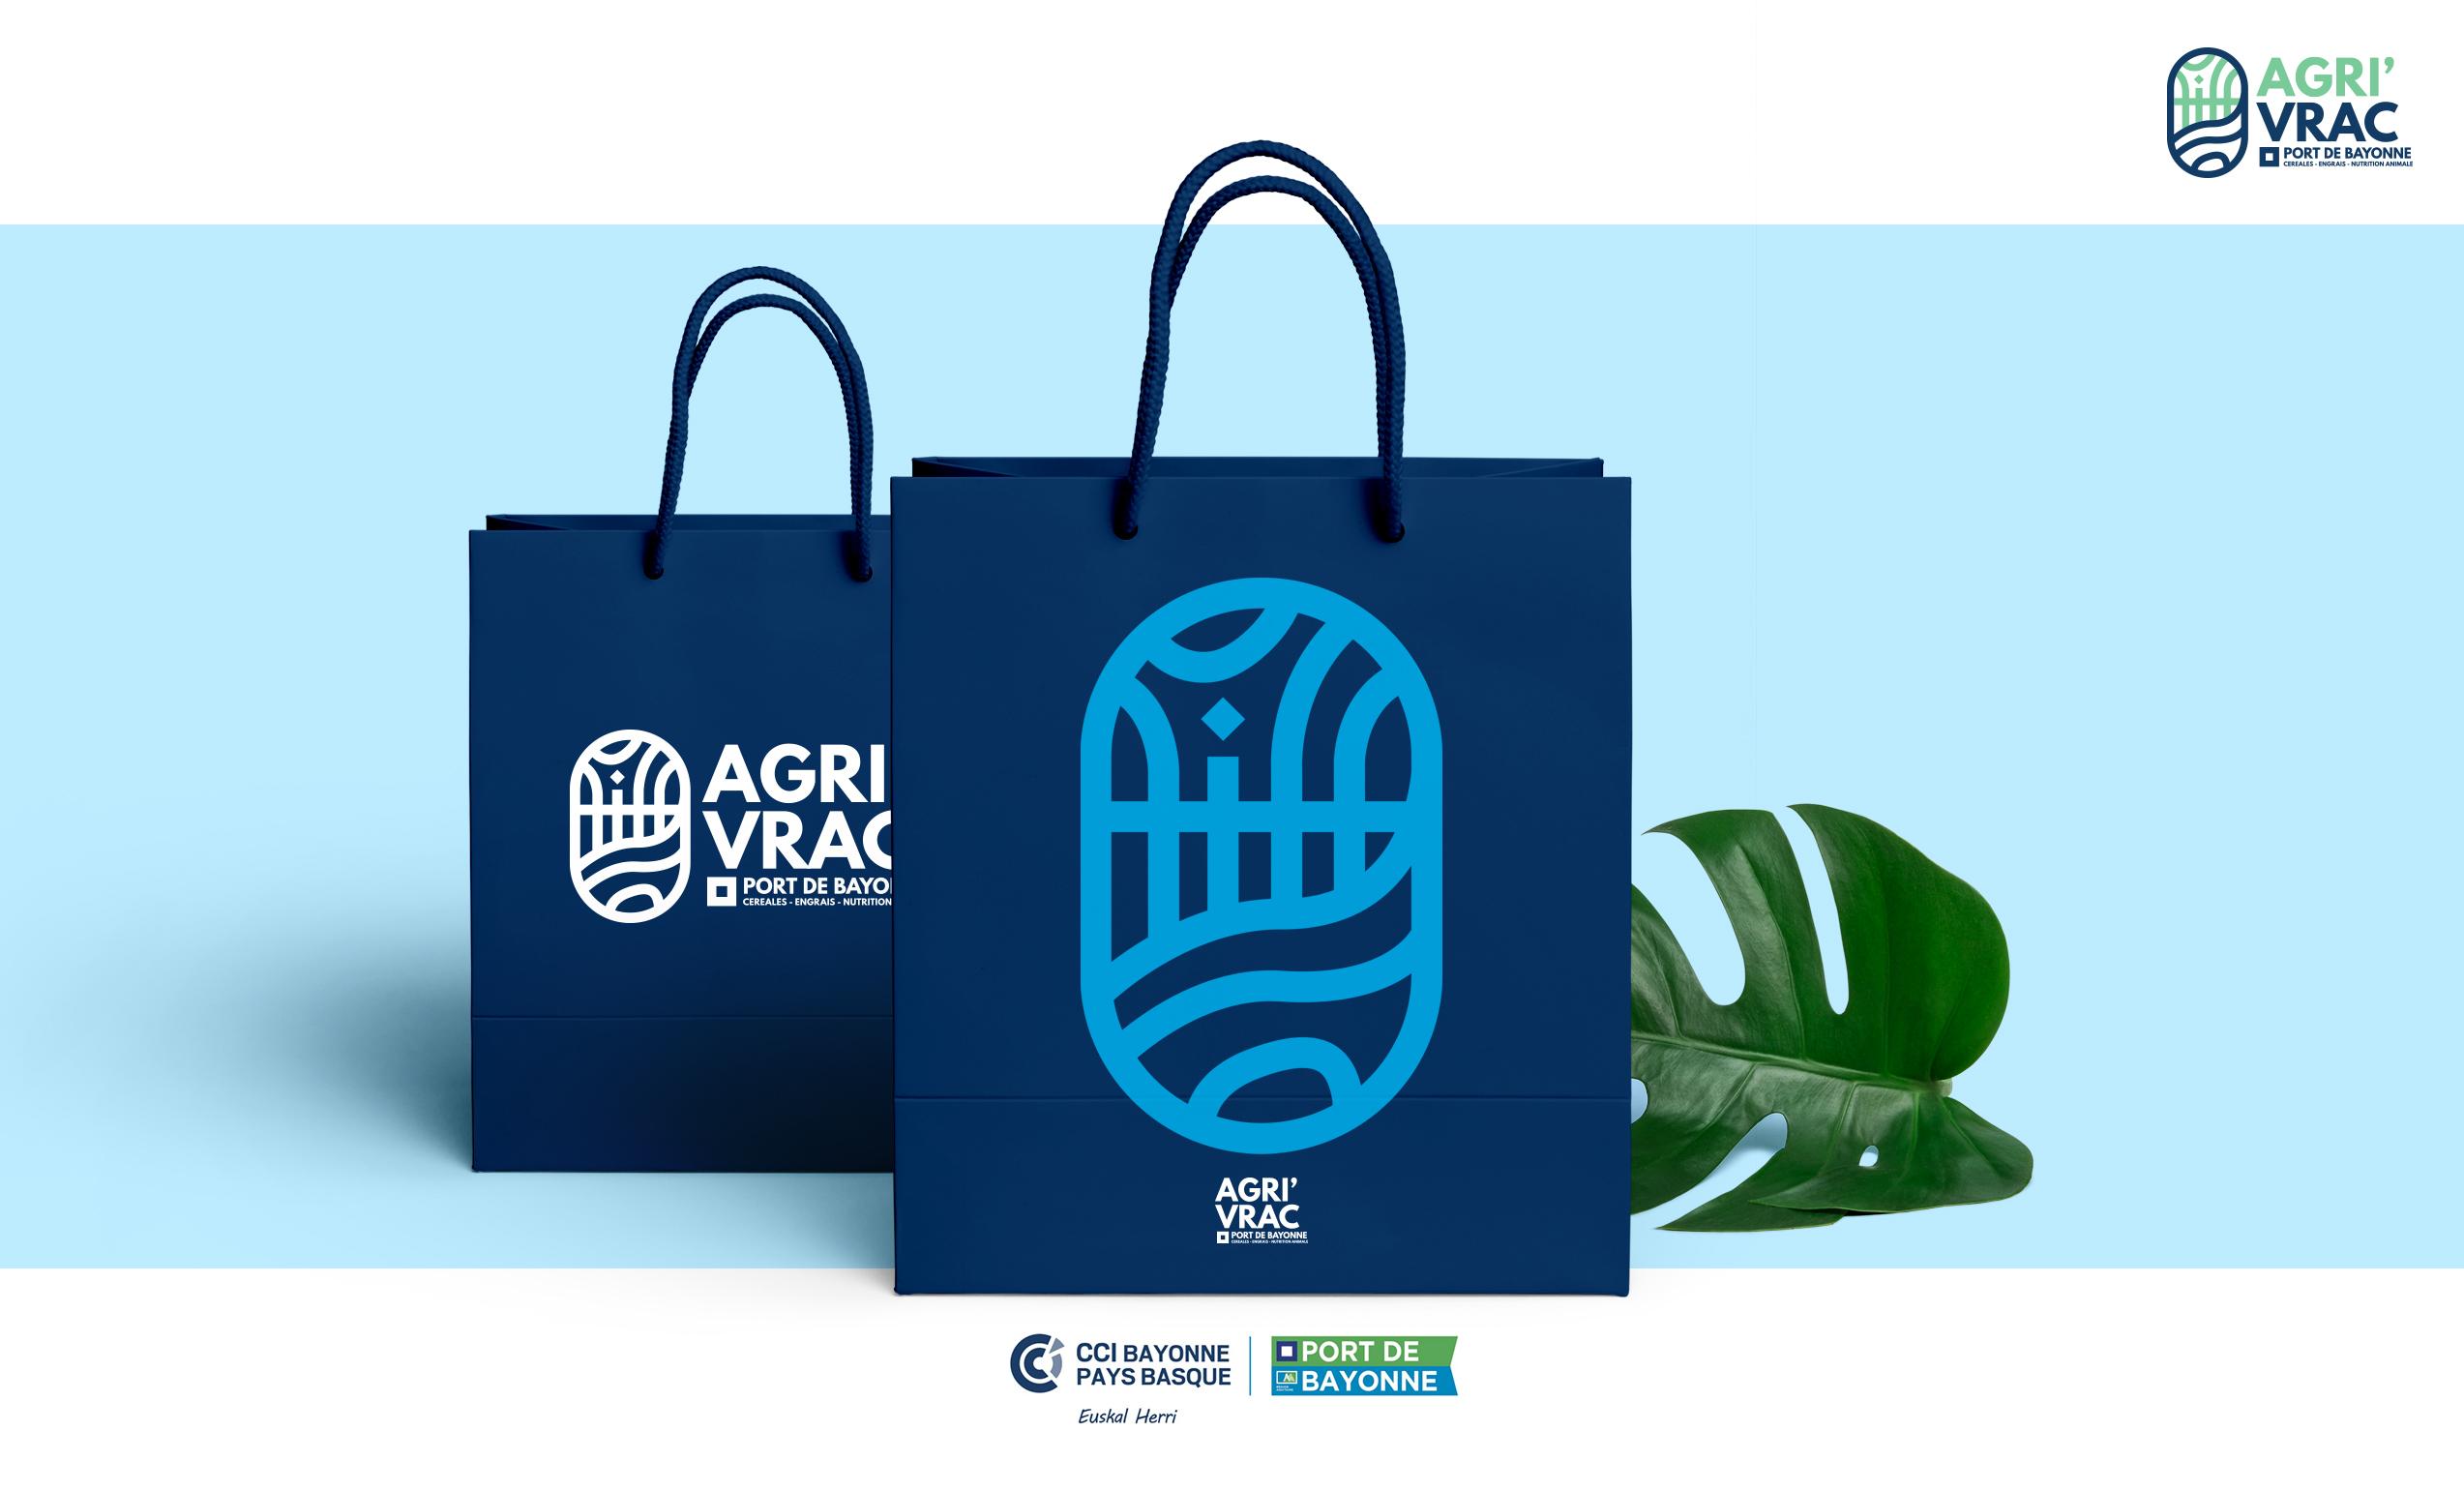 AGRI'VRAC, 1ère Journée Vrac Agroalimentaire !